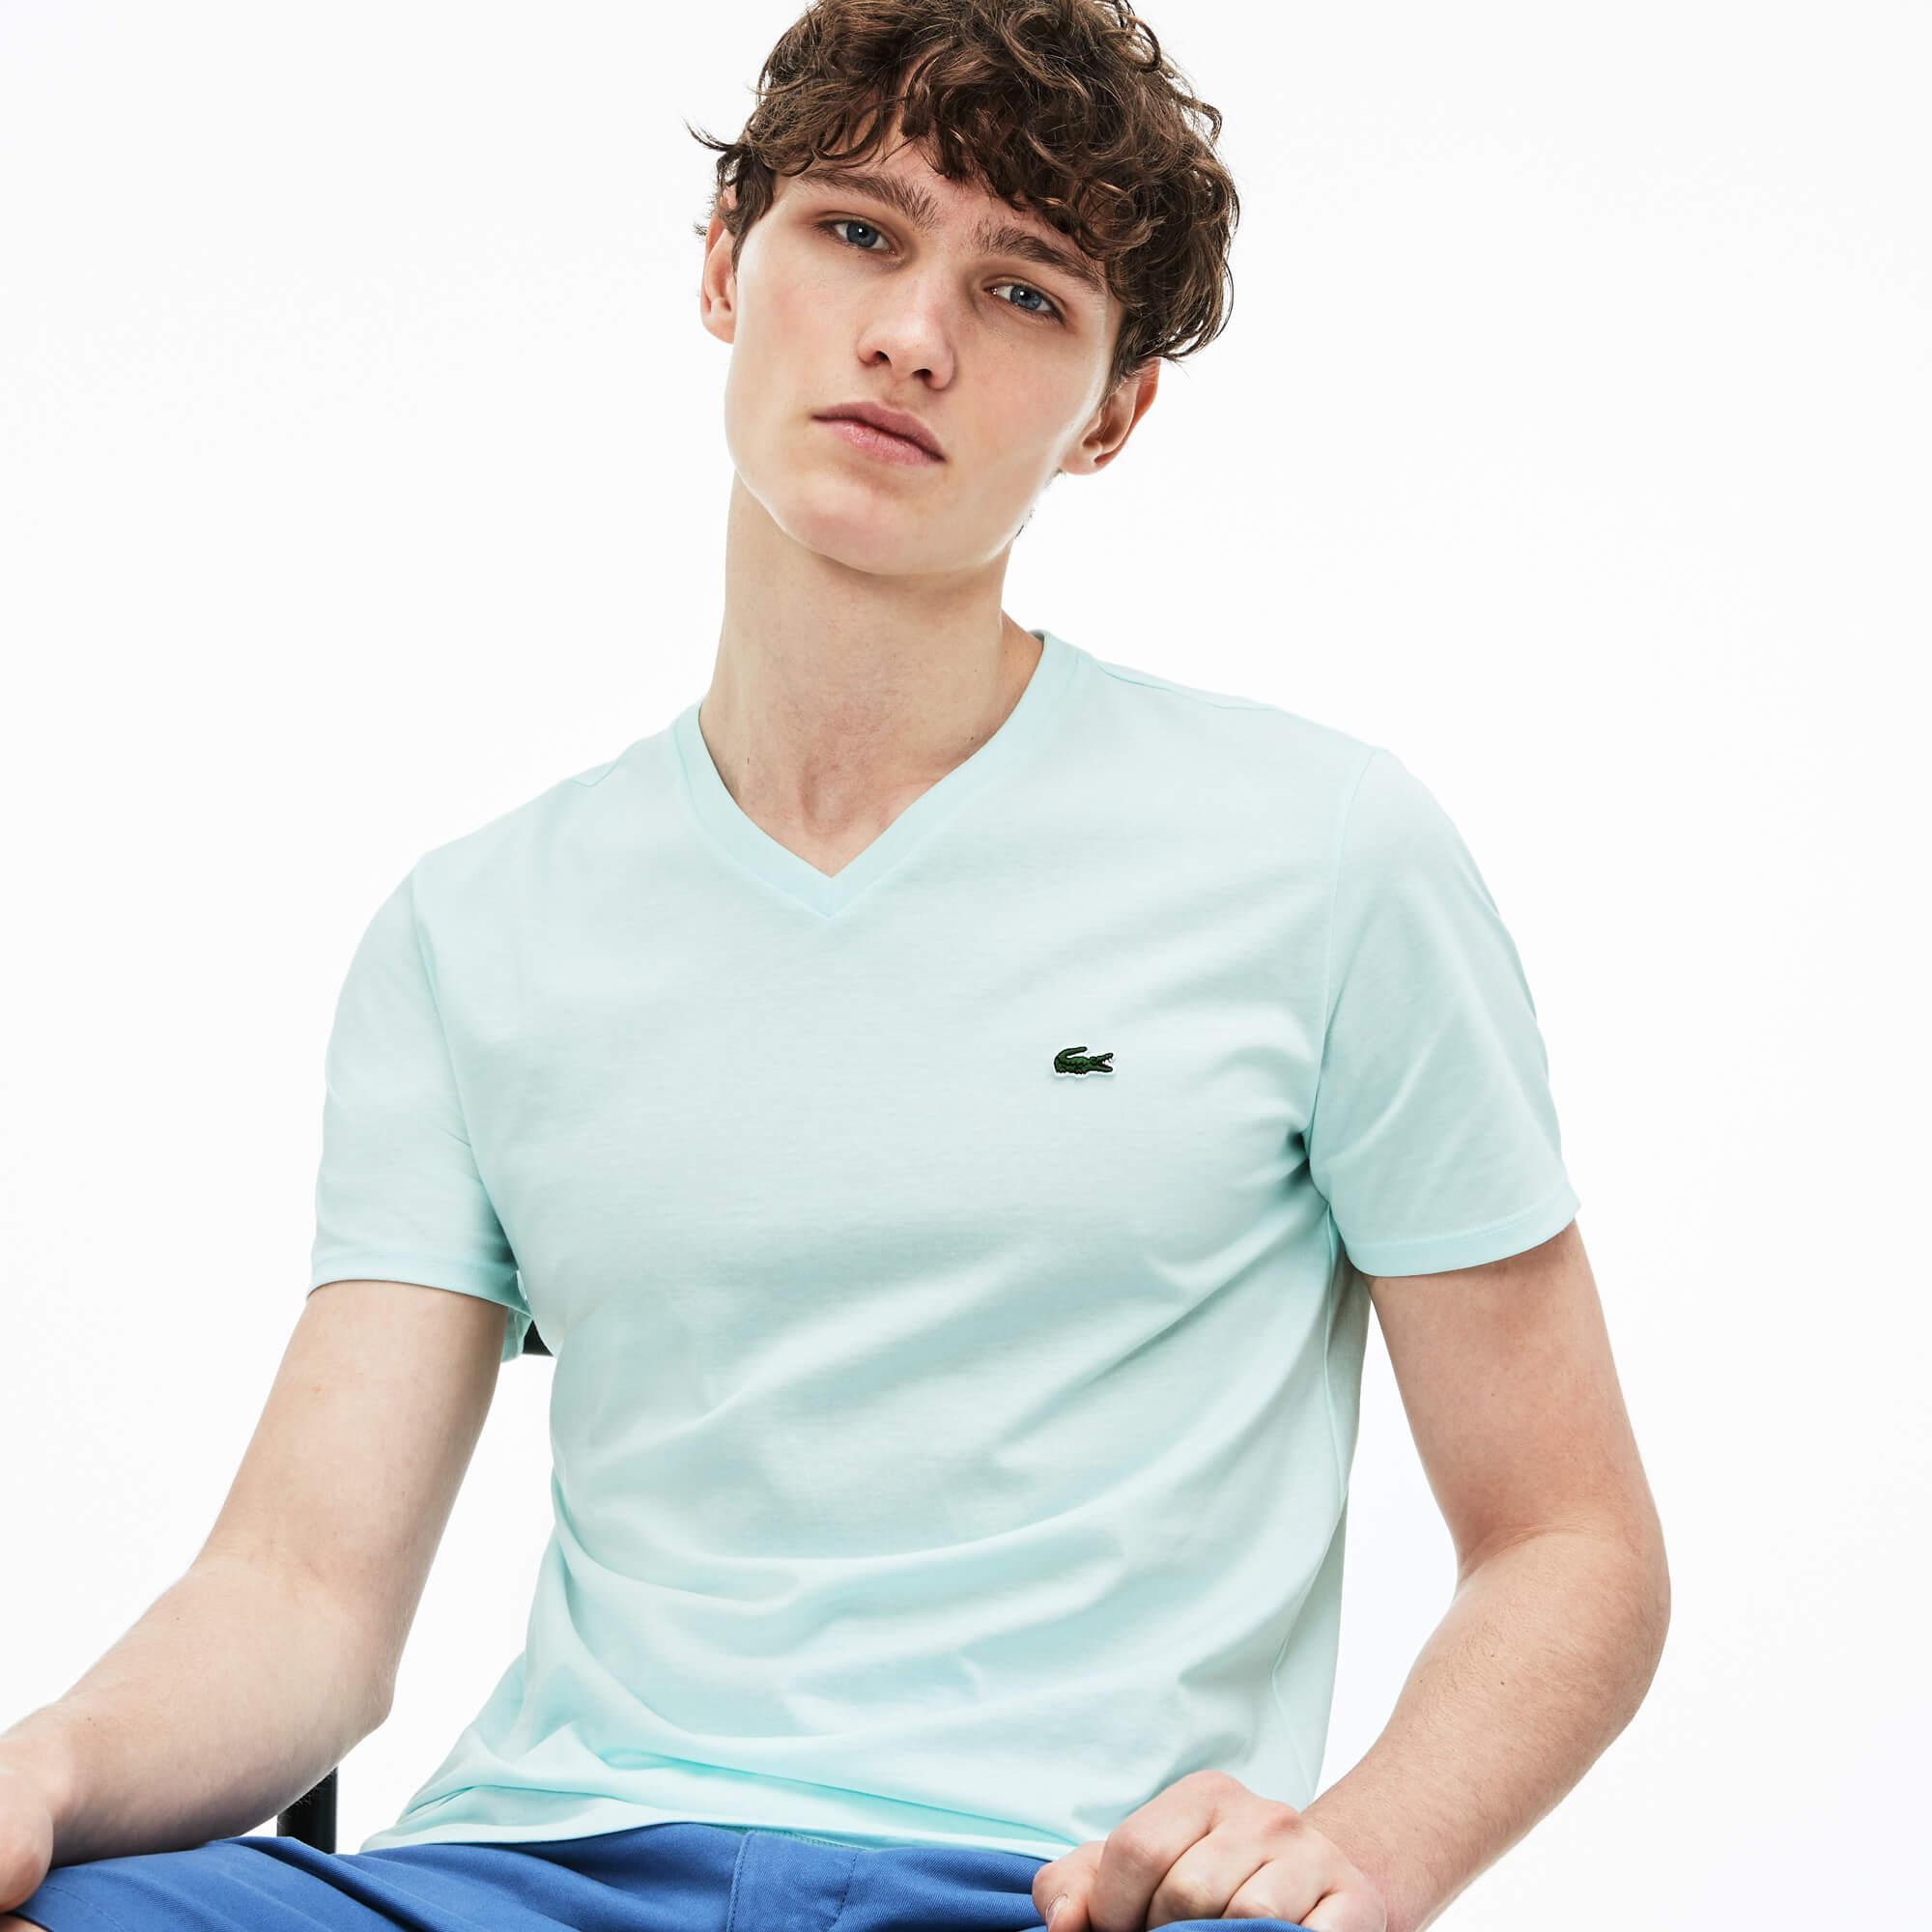 Lacoste Erkek Regular Fit V Yaka Mavi T-Shirt